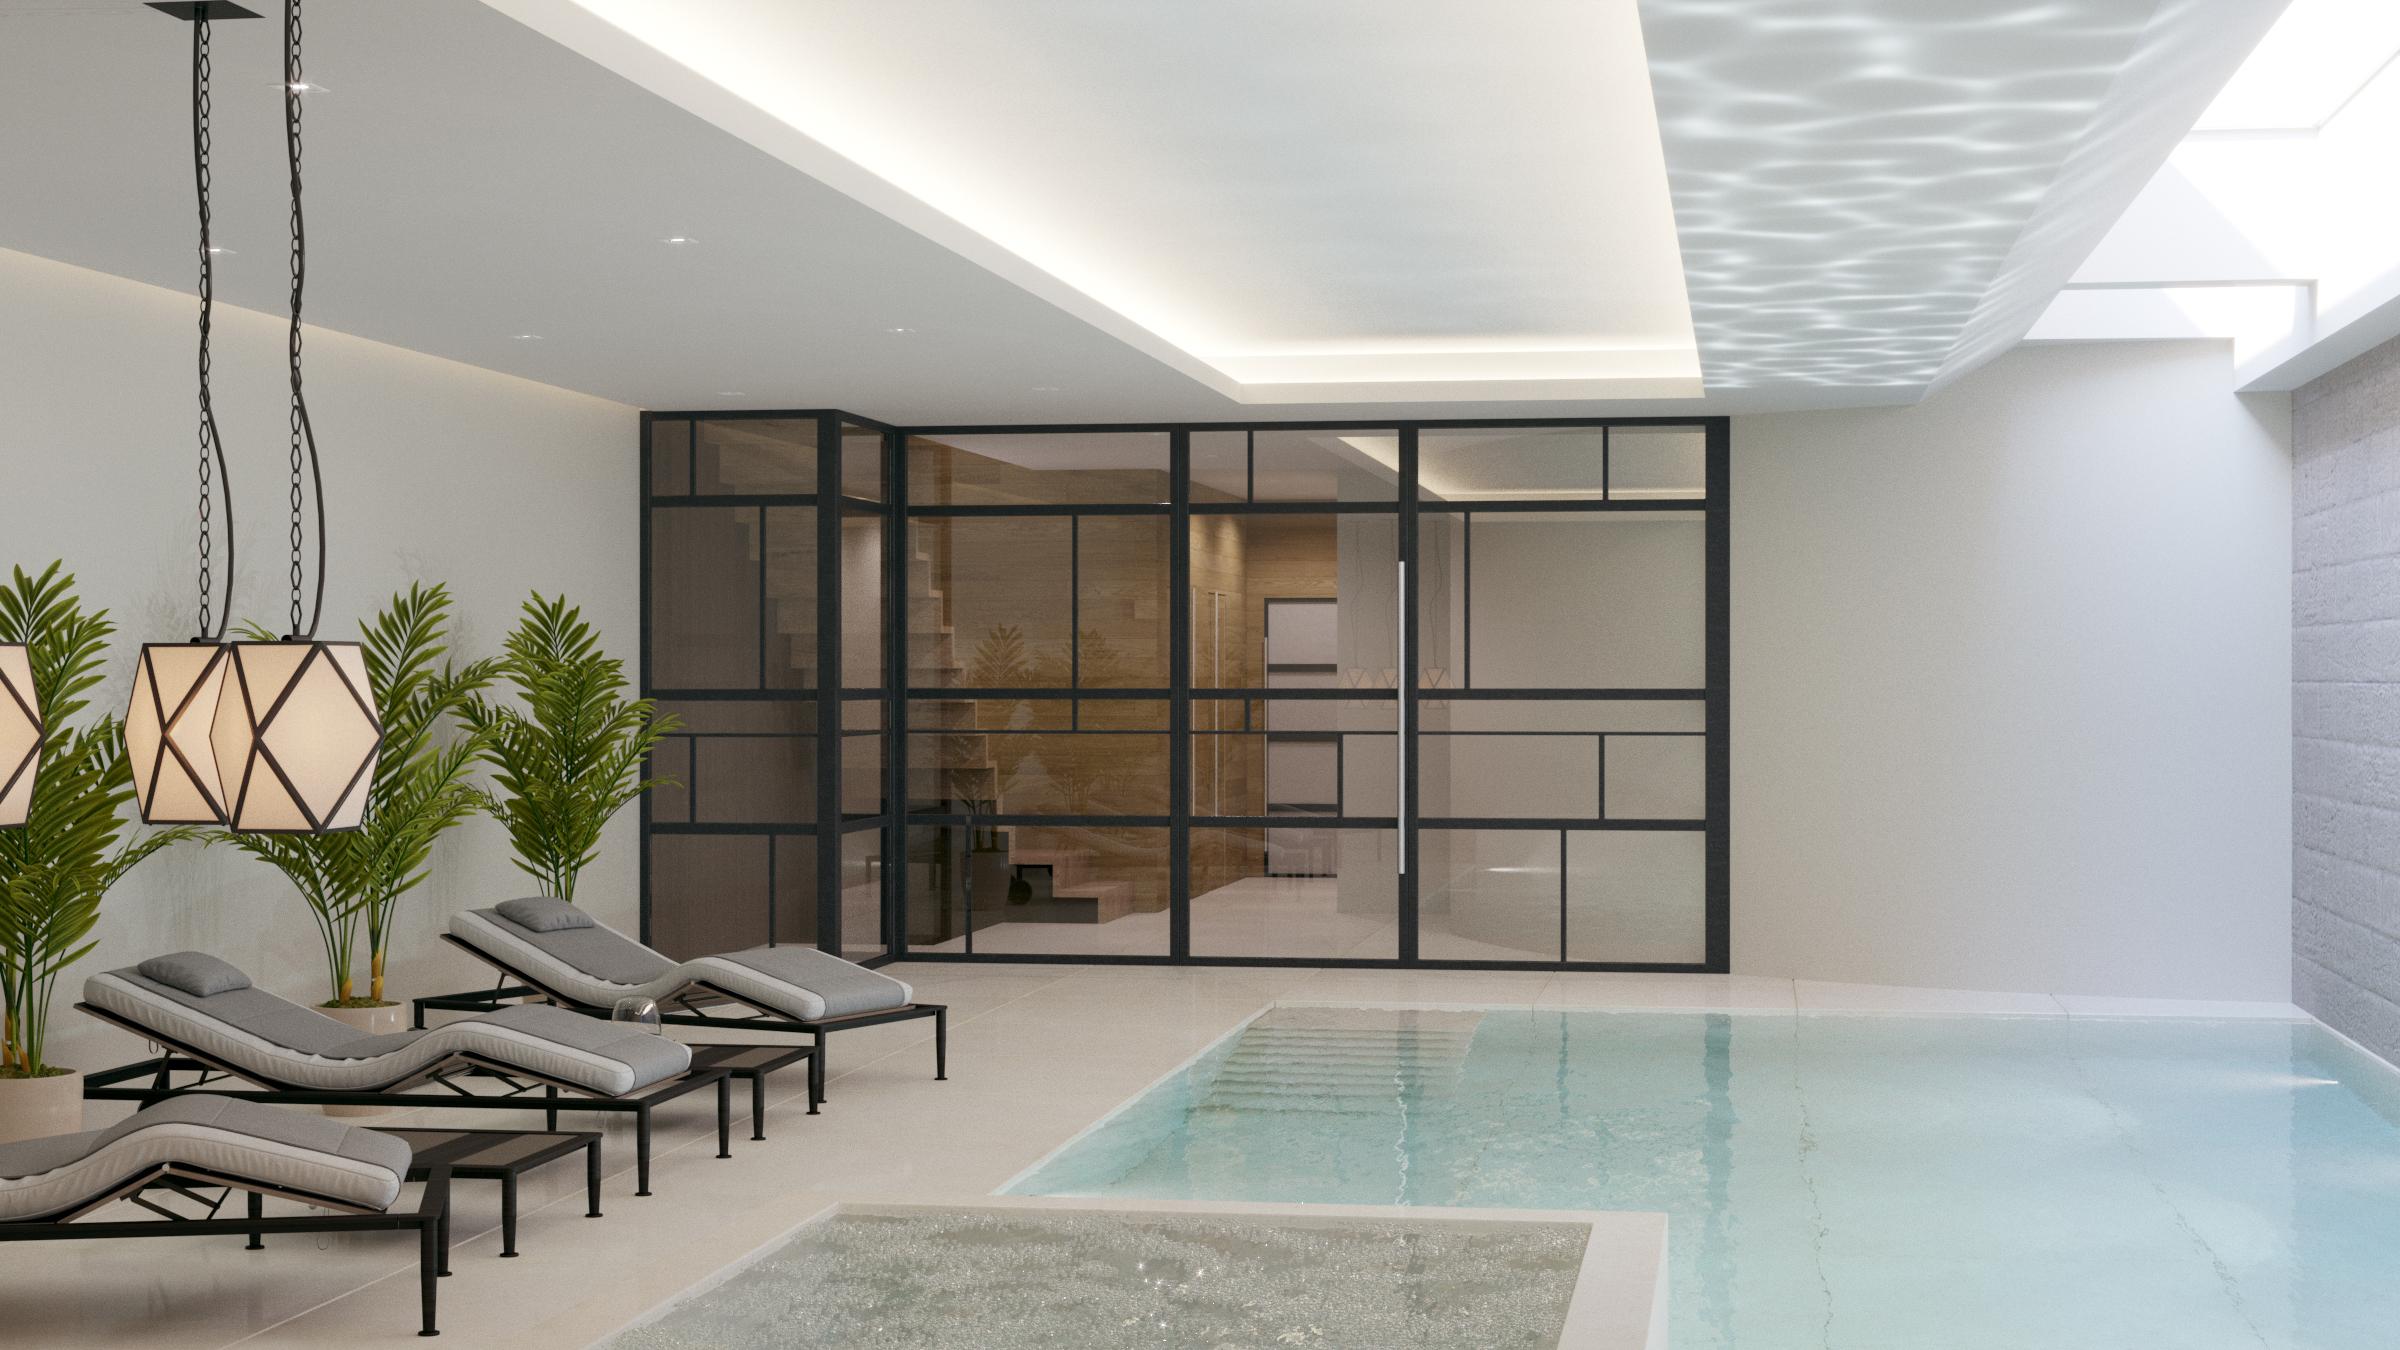 Oxford street london swimming pool design london for Pool design london